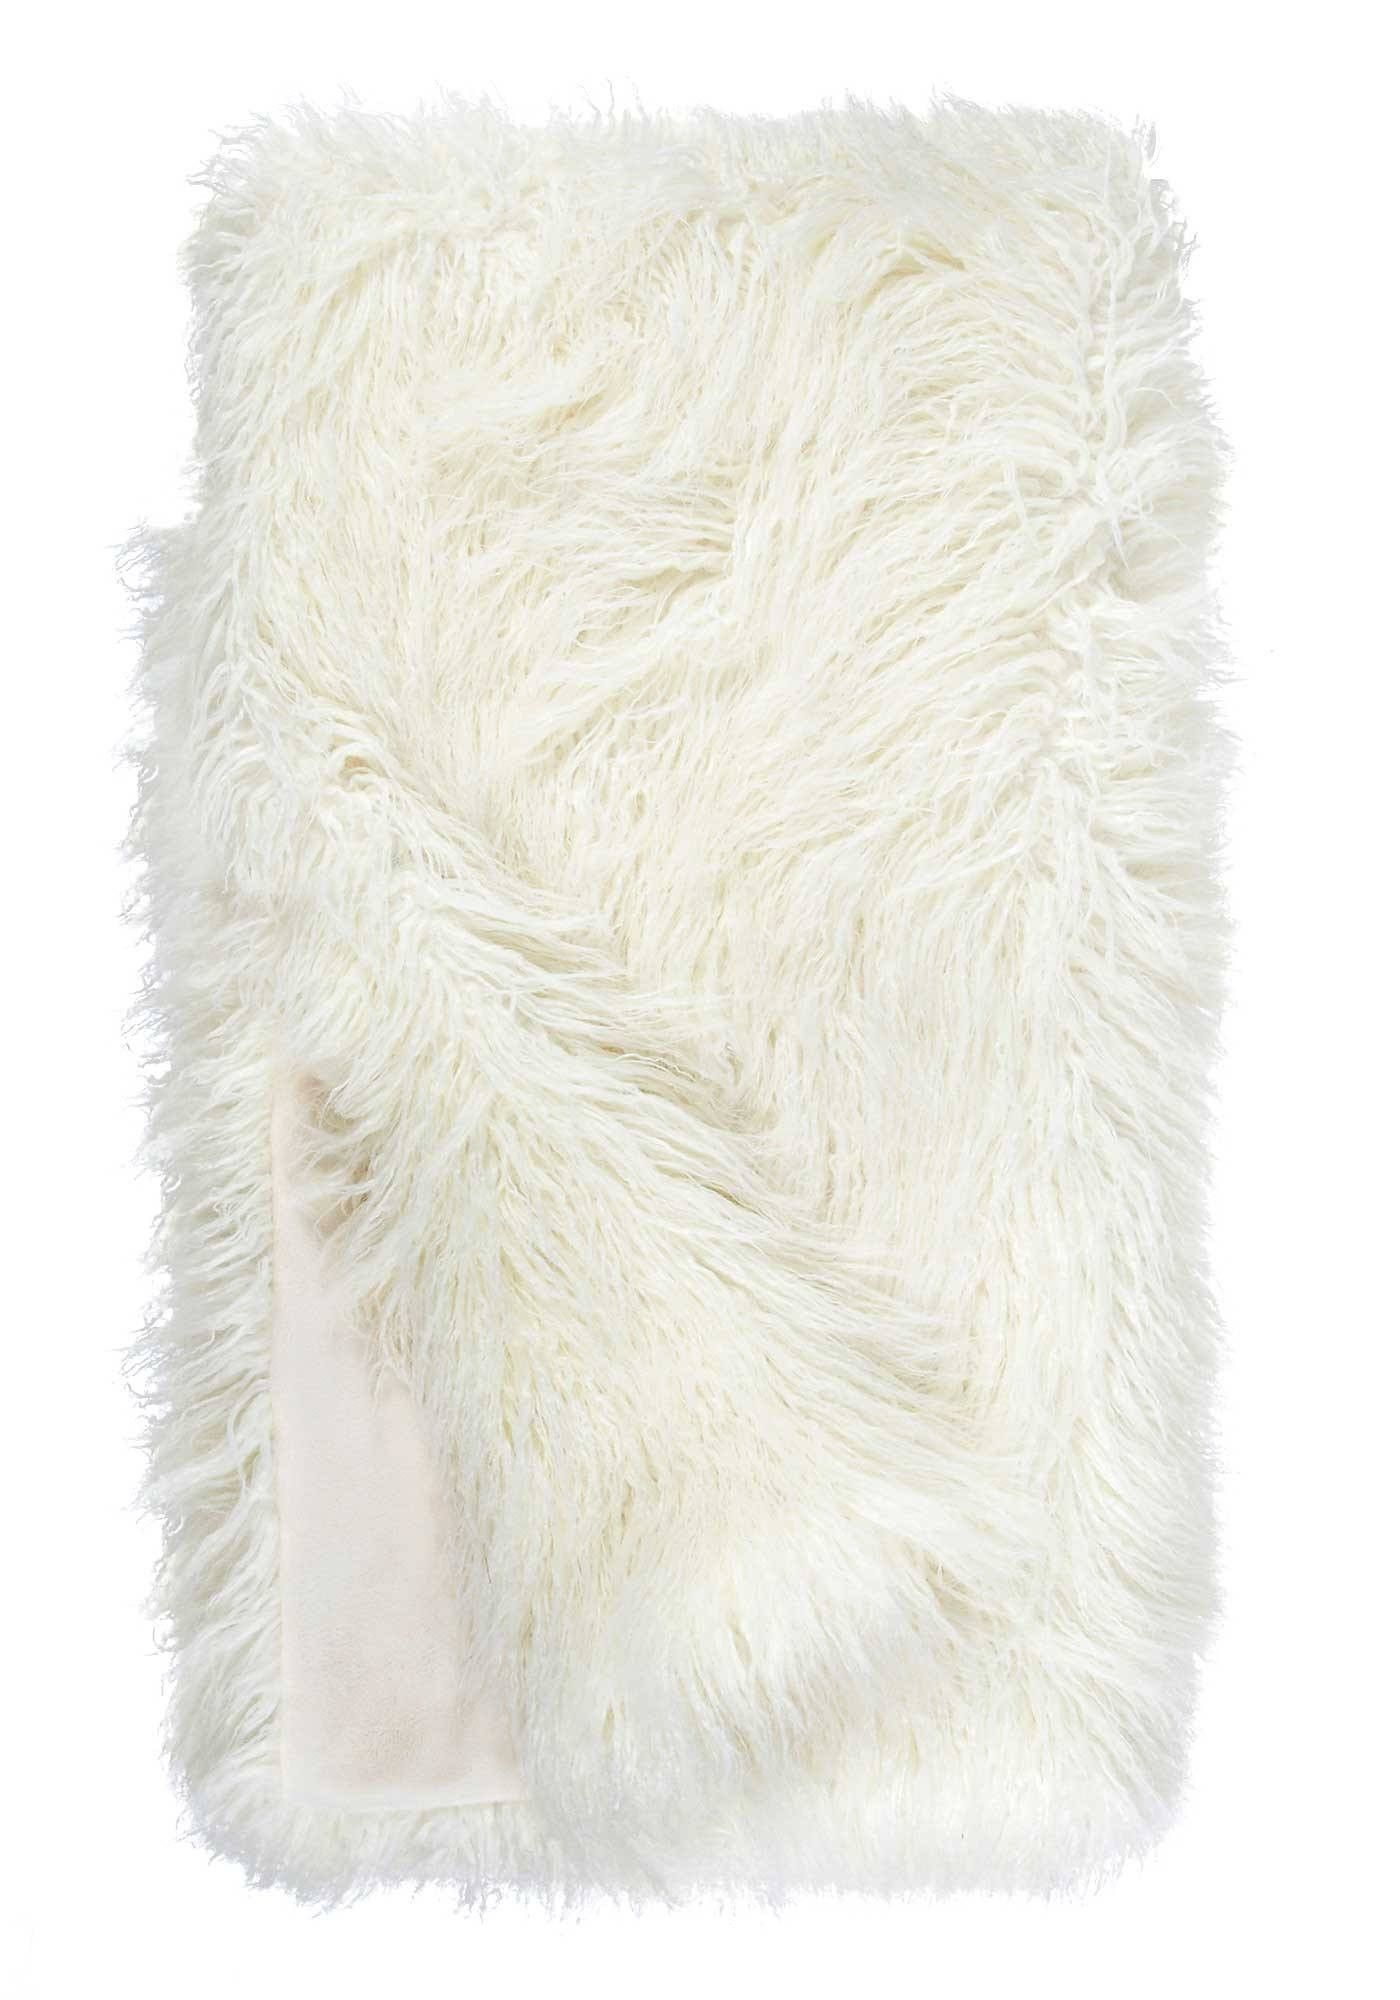 Ivory Tibetan Lamb Signature Series Faux Fur Throw Blanket By